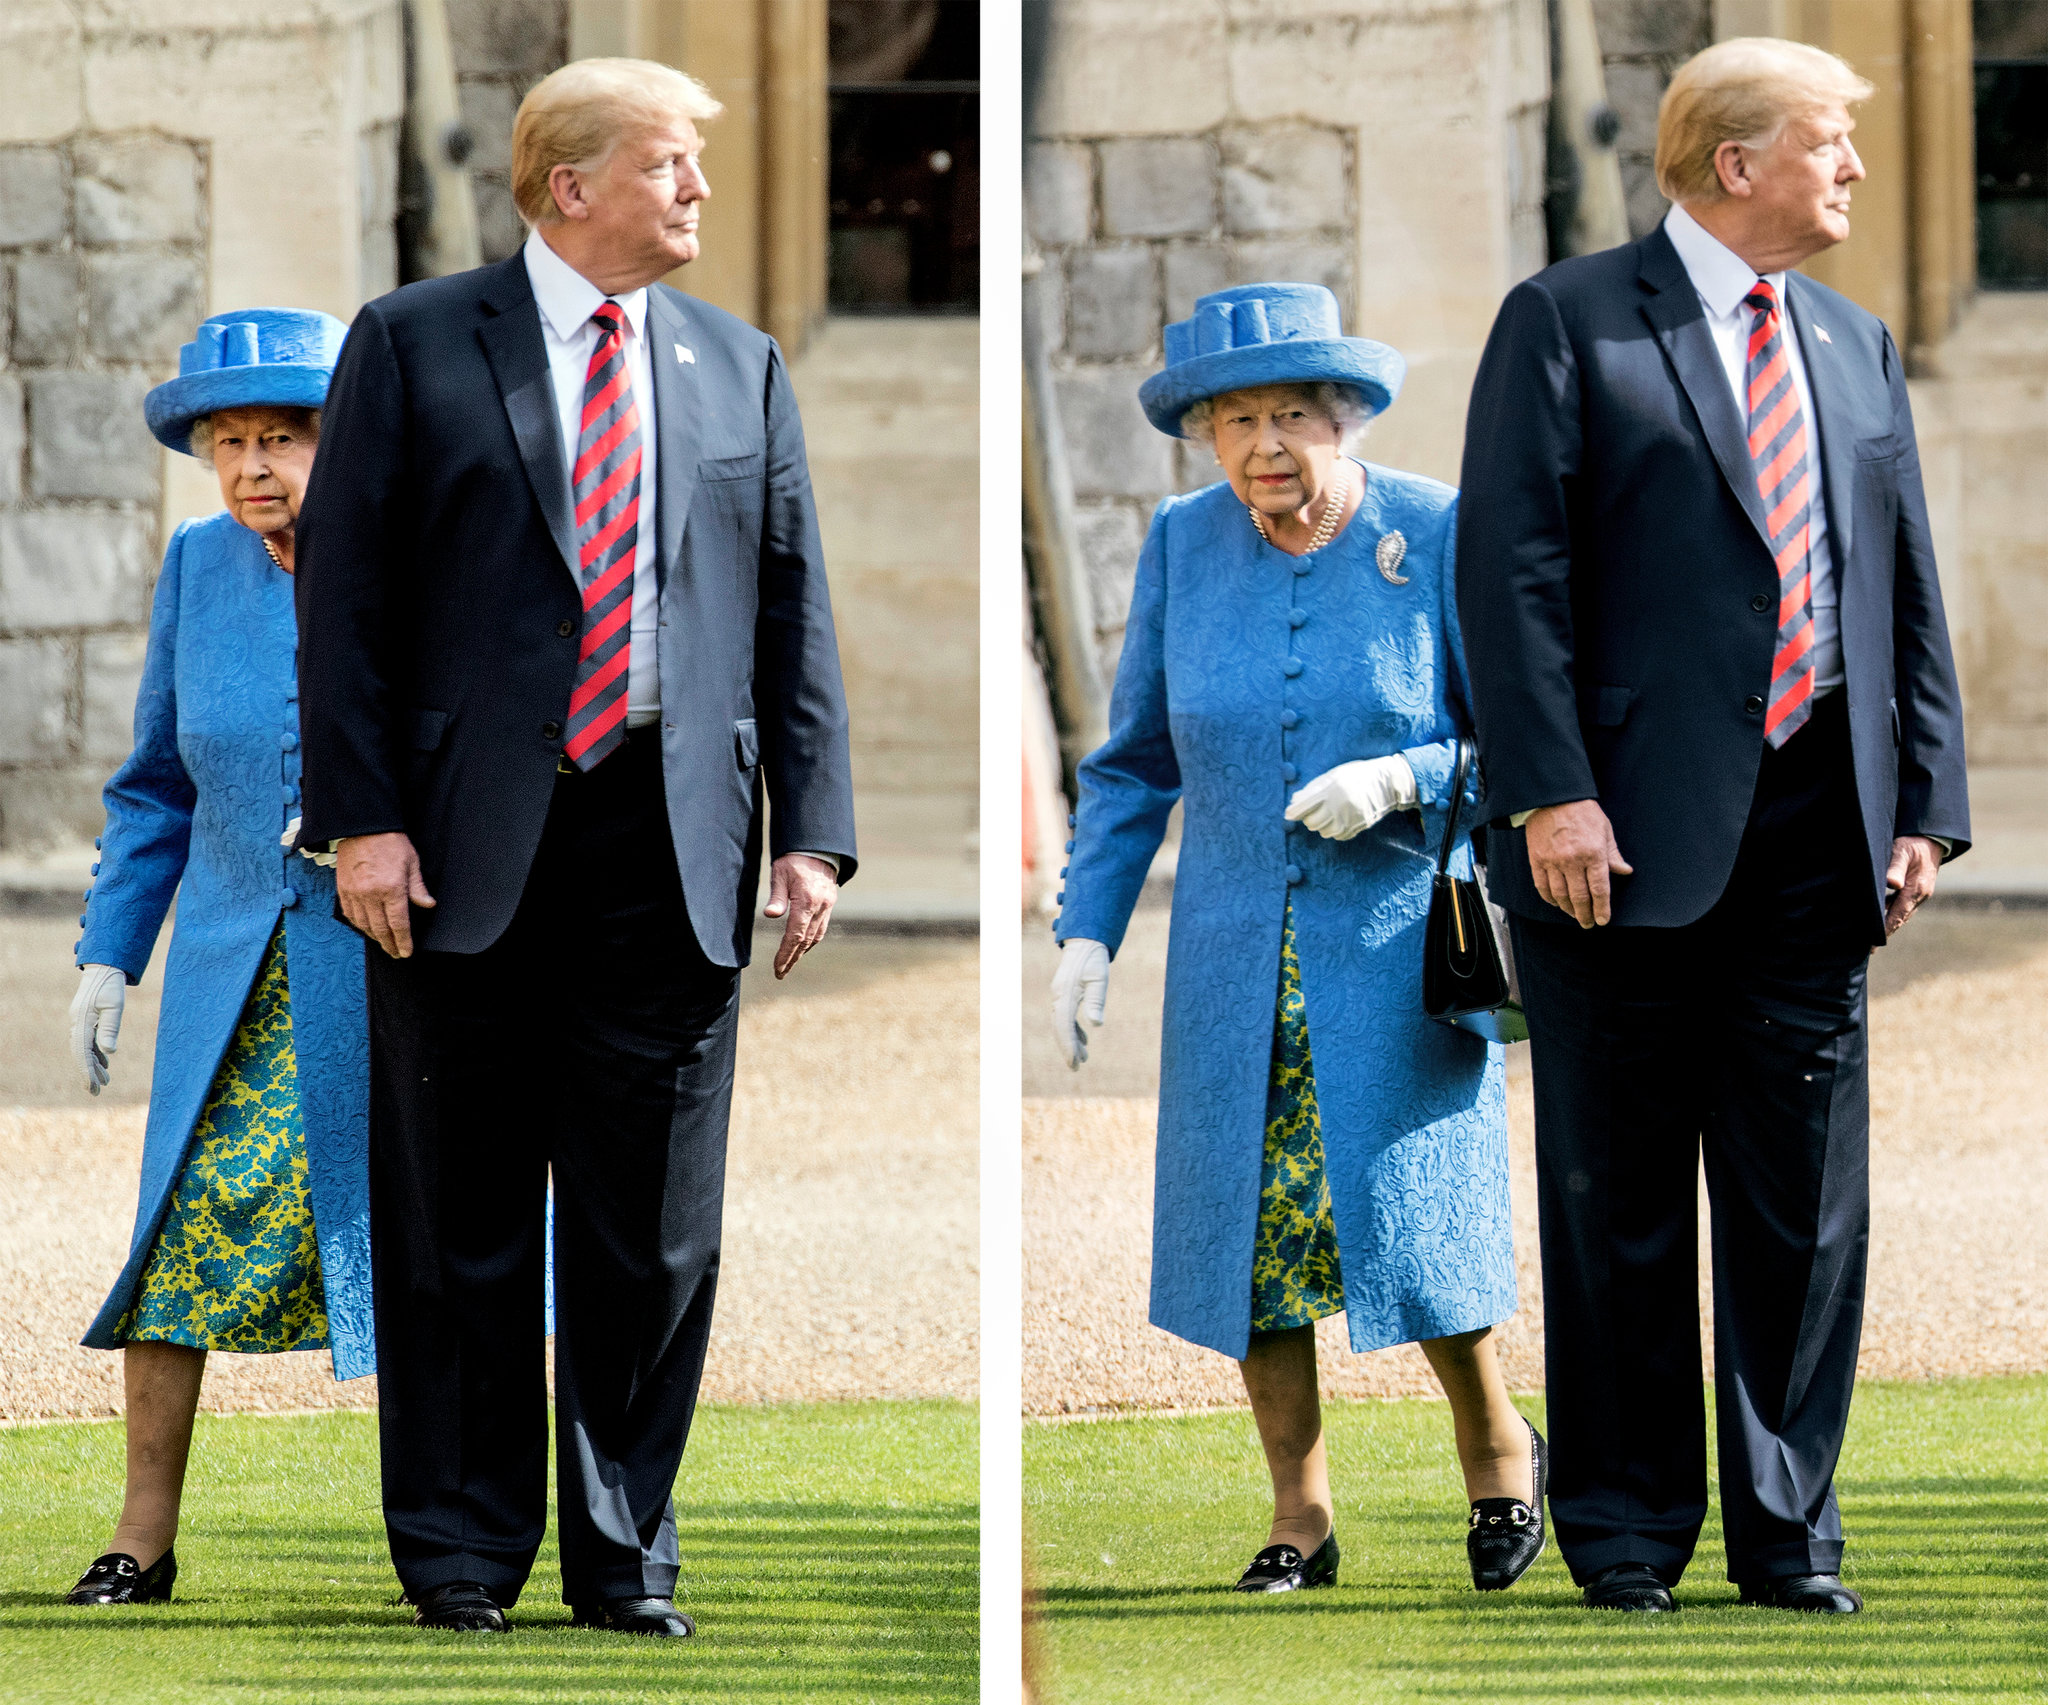 Trump Walks In Front Of Queen Elizabeth Causing Social Media